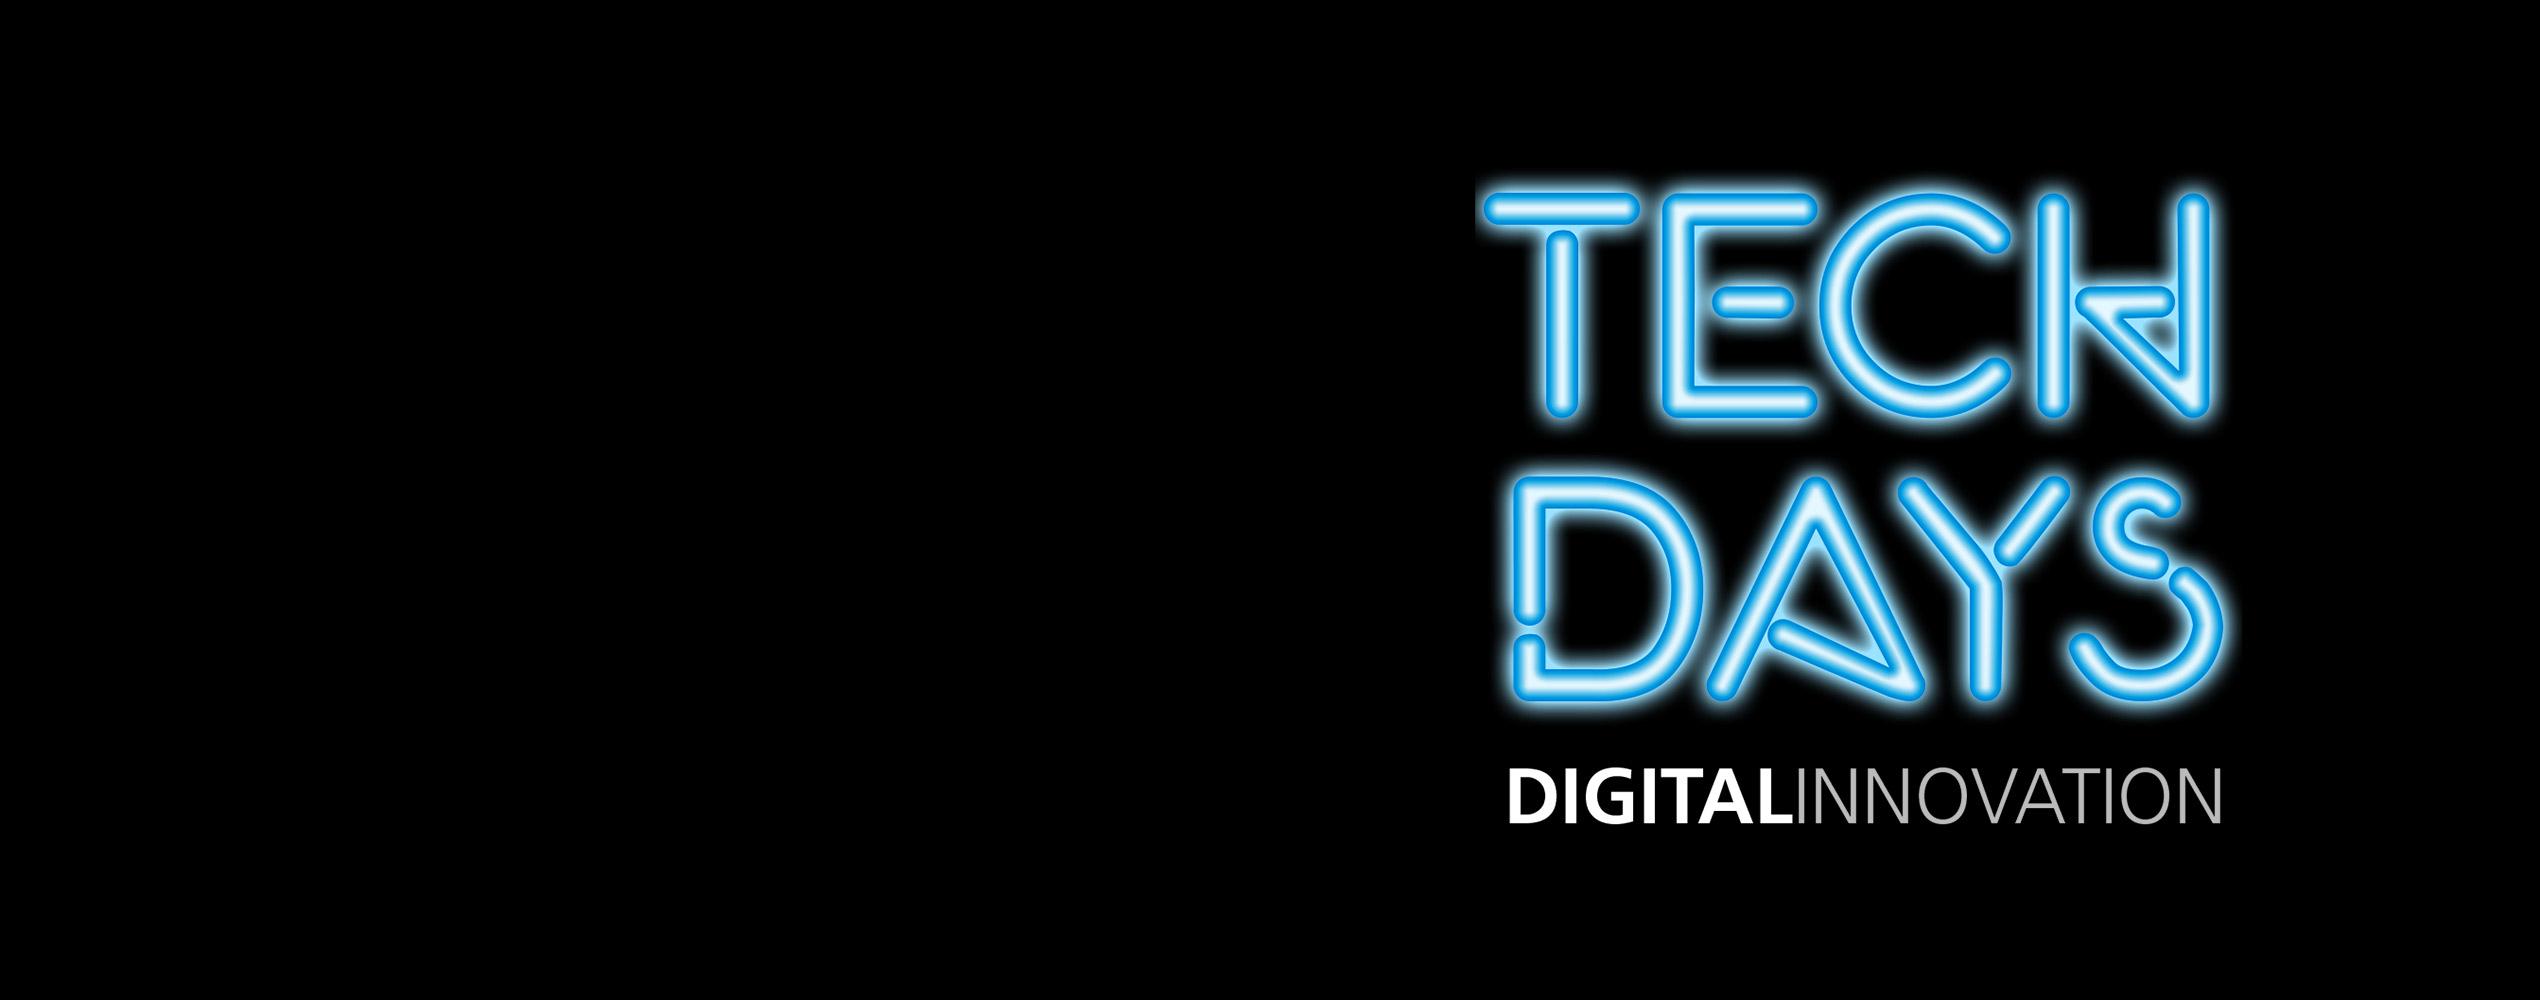 HEADER-logo_techdays_glow_digitalInnovation-2540x1000